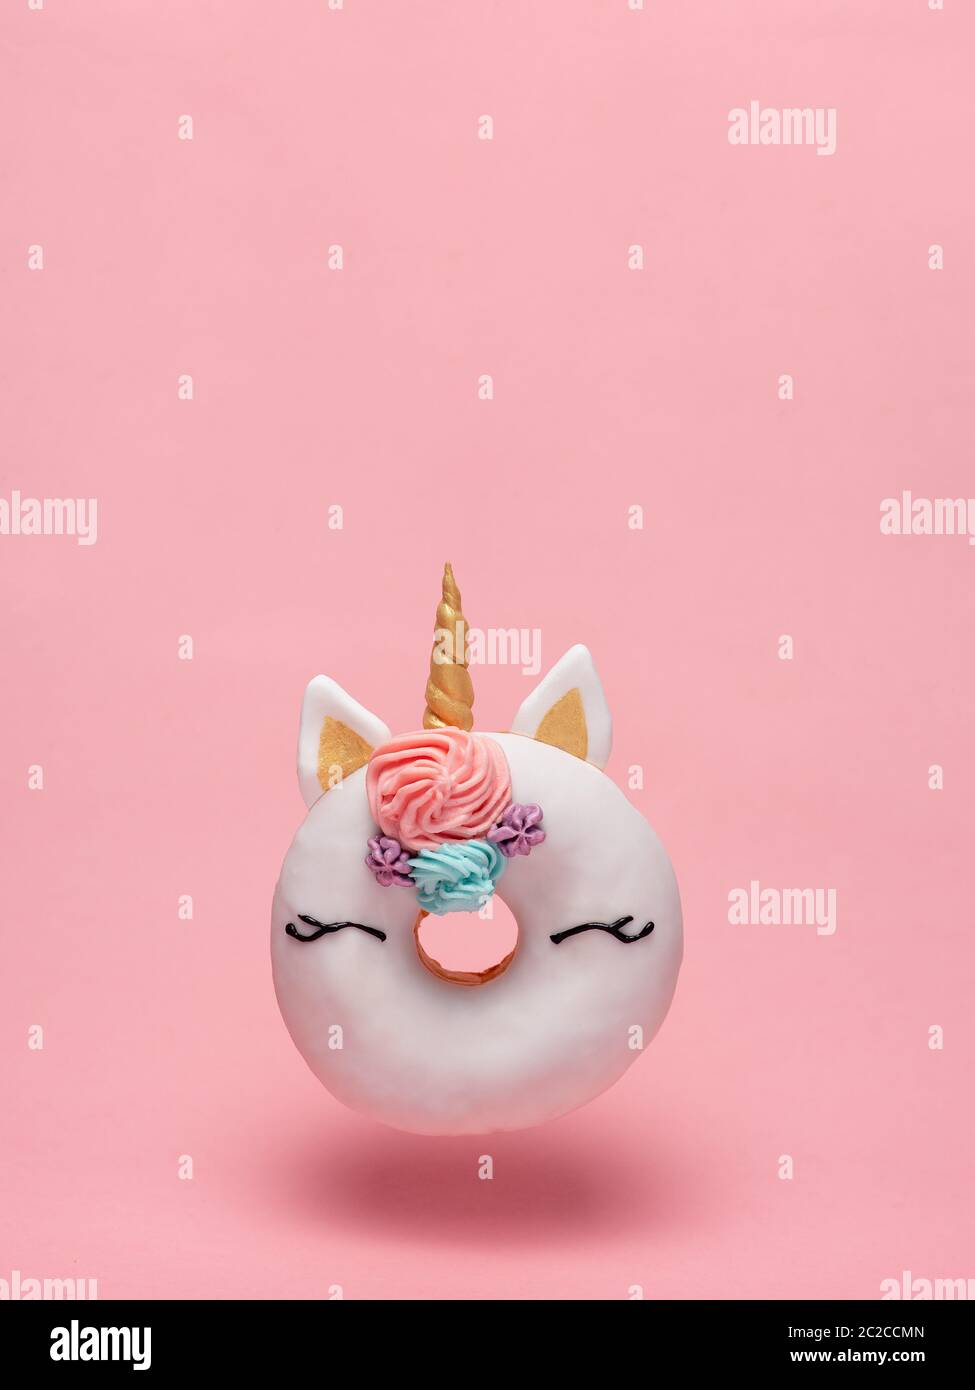 Unicorn Donut Flying Pink Background Copy Space Stock Photo Alamy